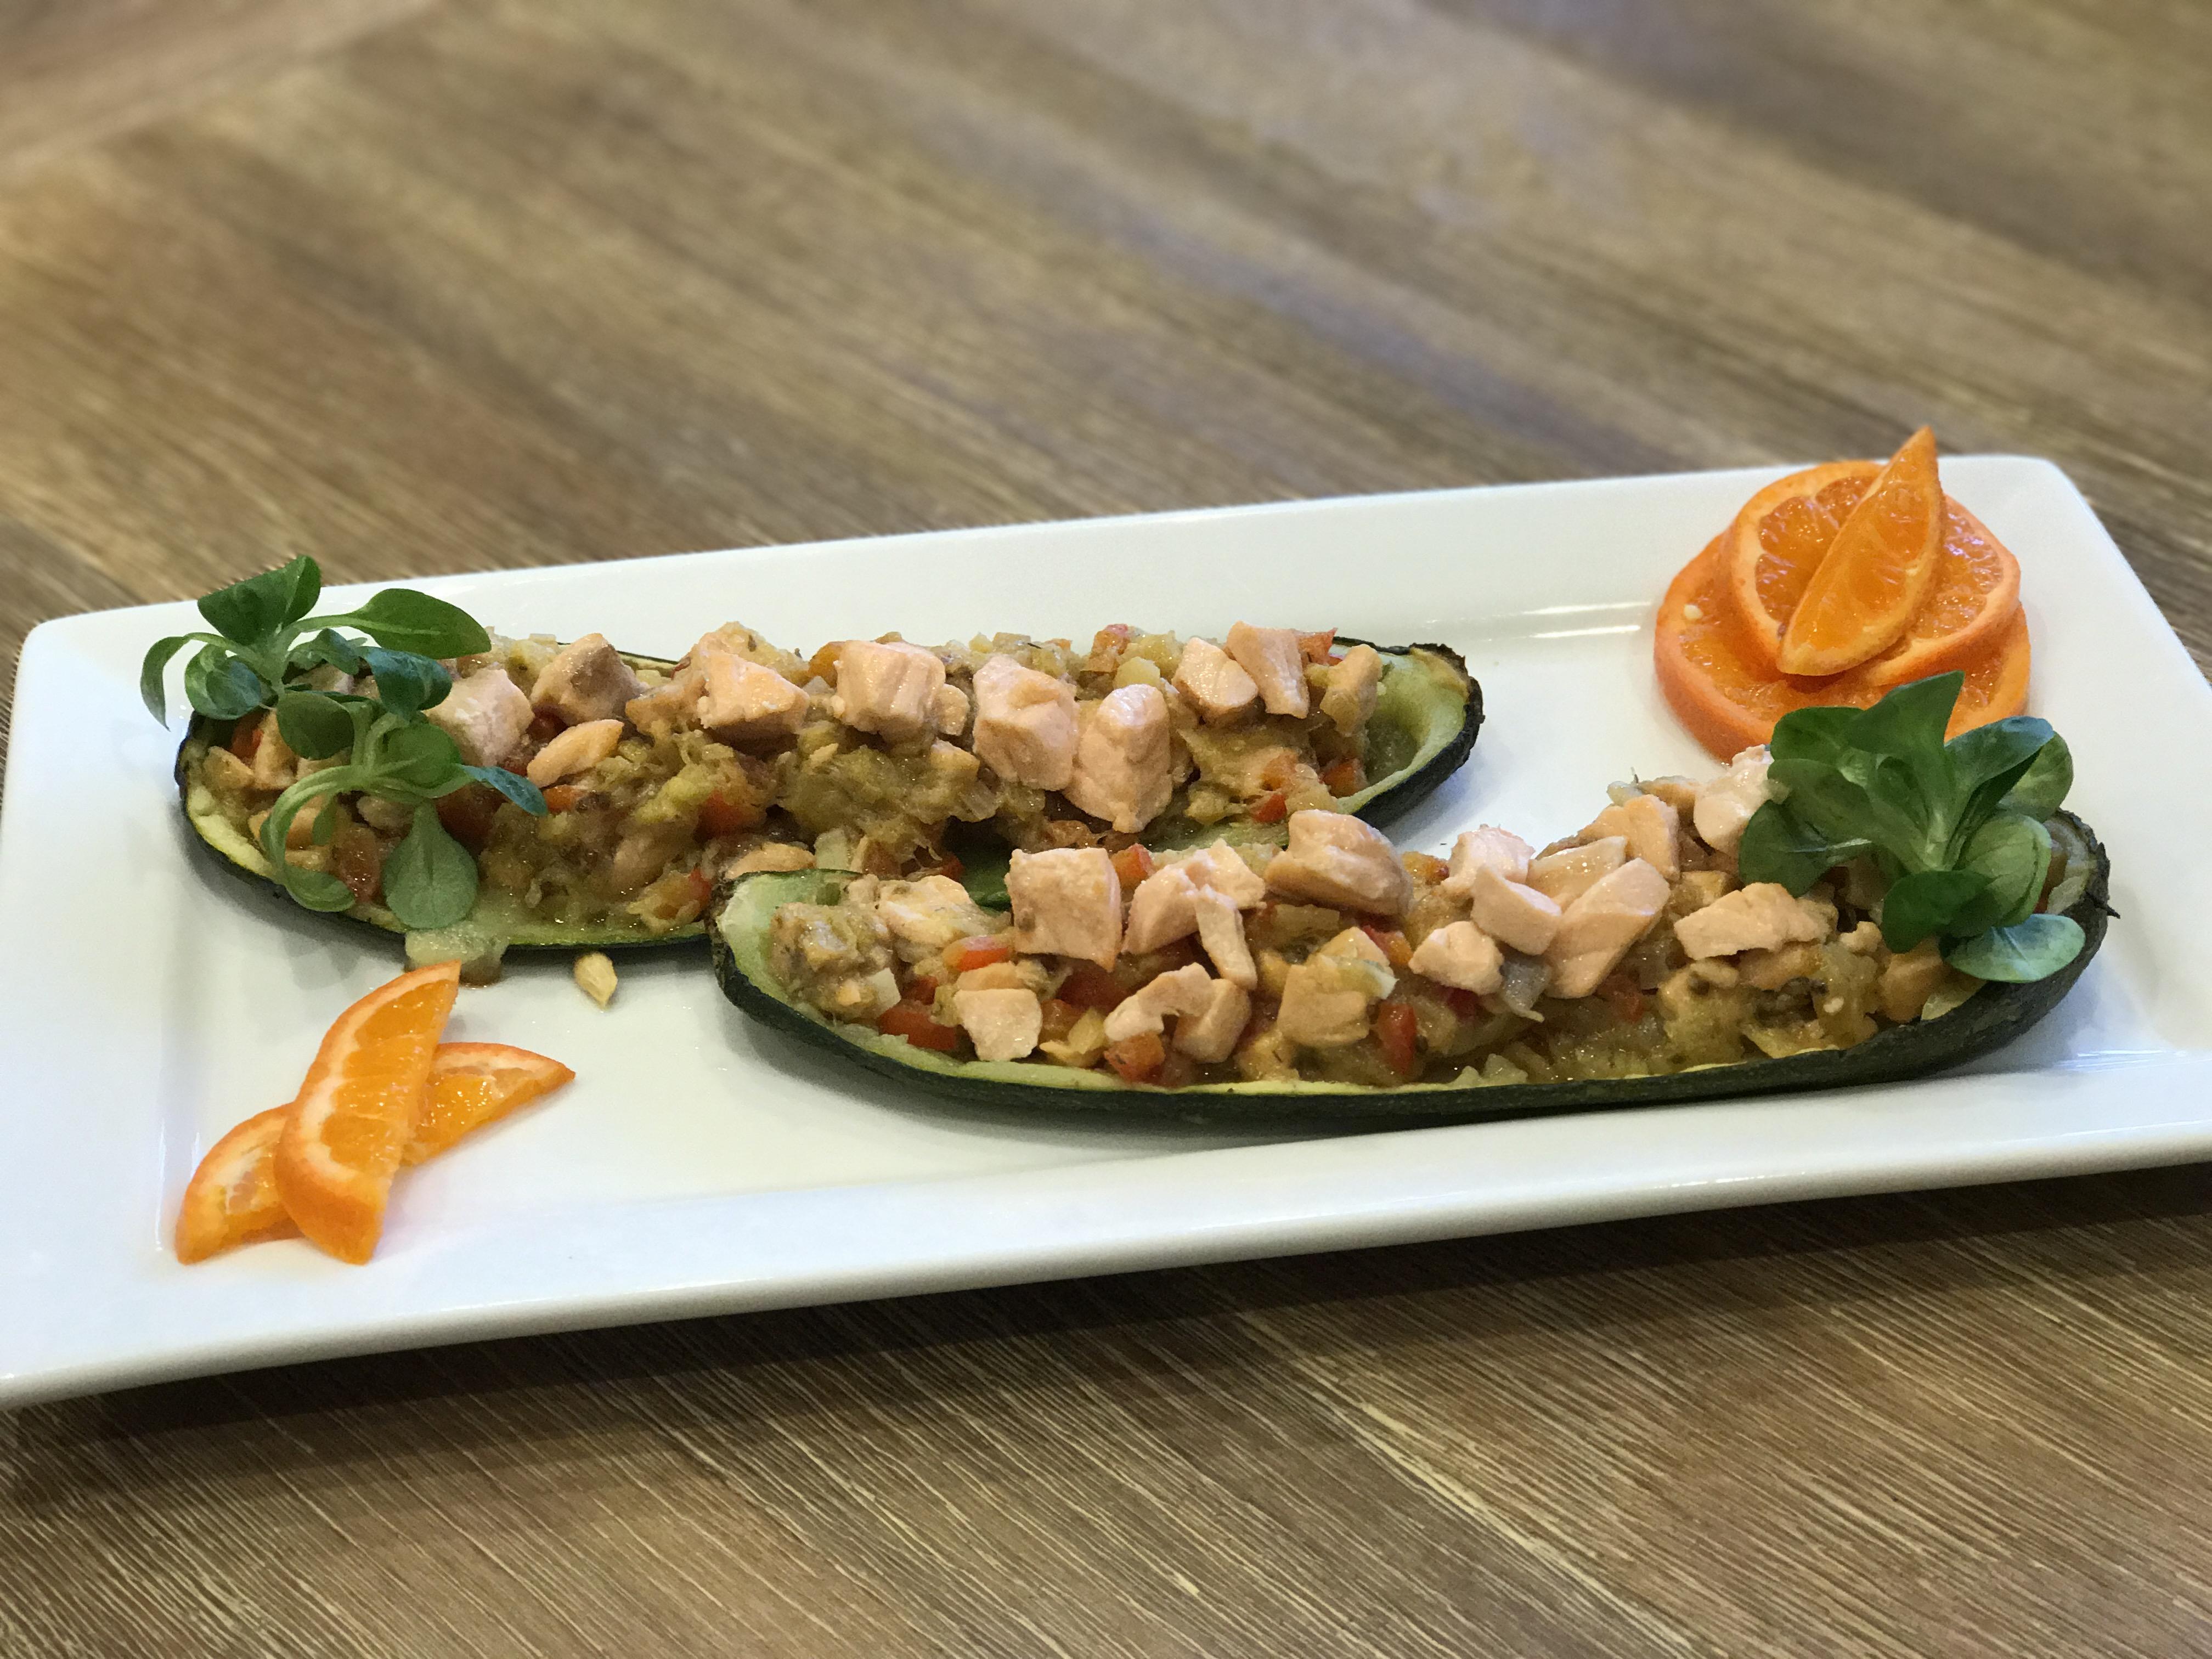 calabacines rellenos de salmón